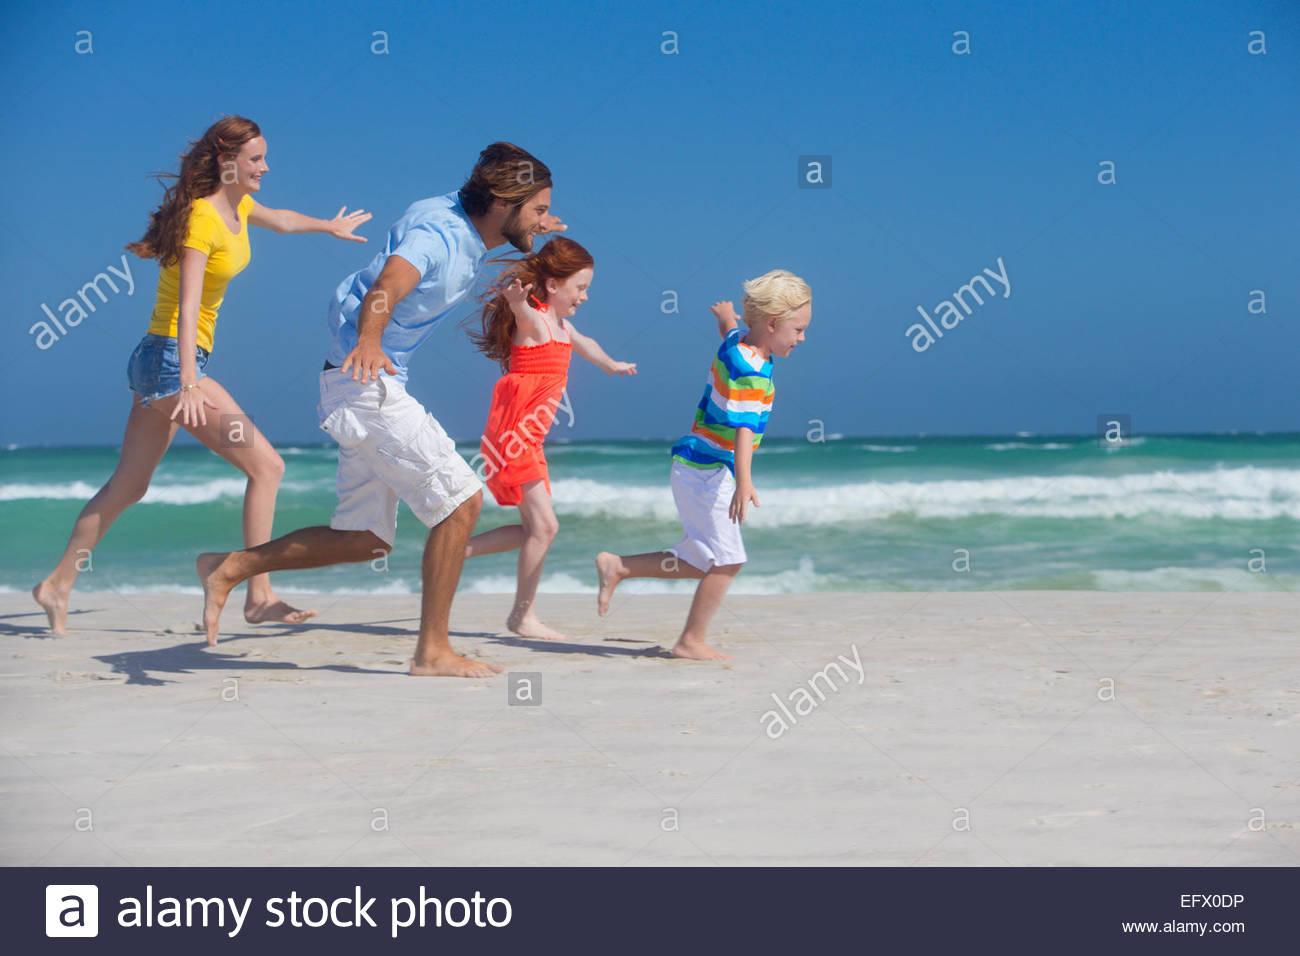 Smiling Family, pretending to fly, running on sunny beach - Stock Image